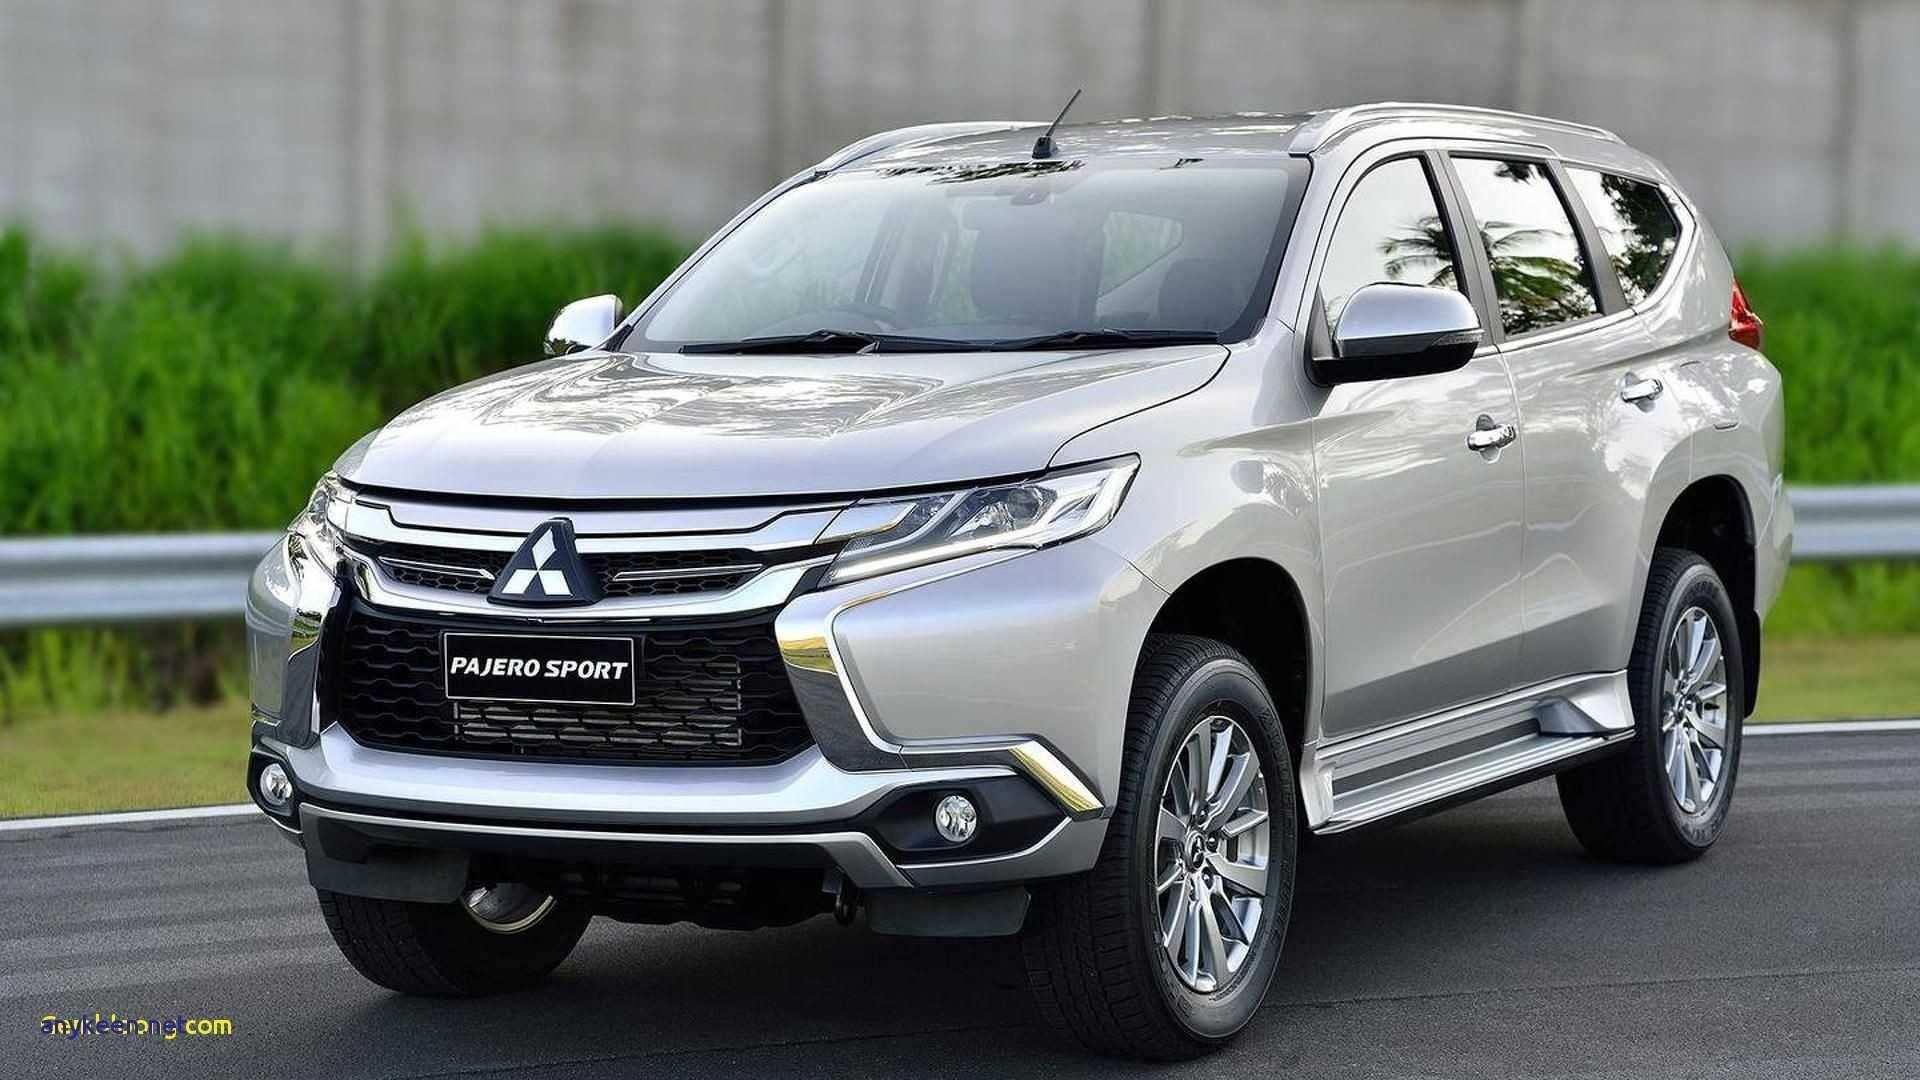 77 Concept of Mitsubishi Montero Sport 2020 Philippines Reviews for Mitsubishi Montero Sport 2020 Philippines